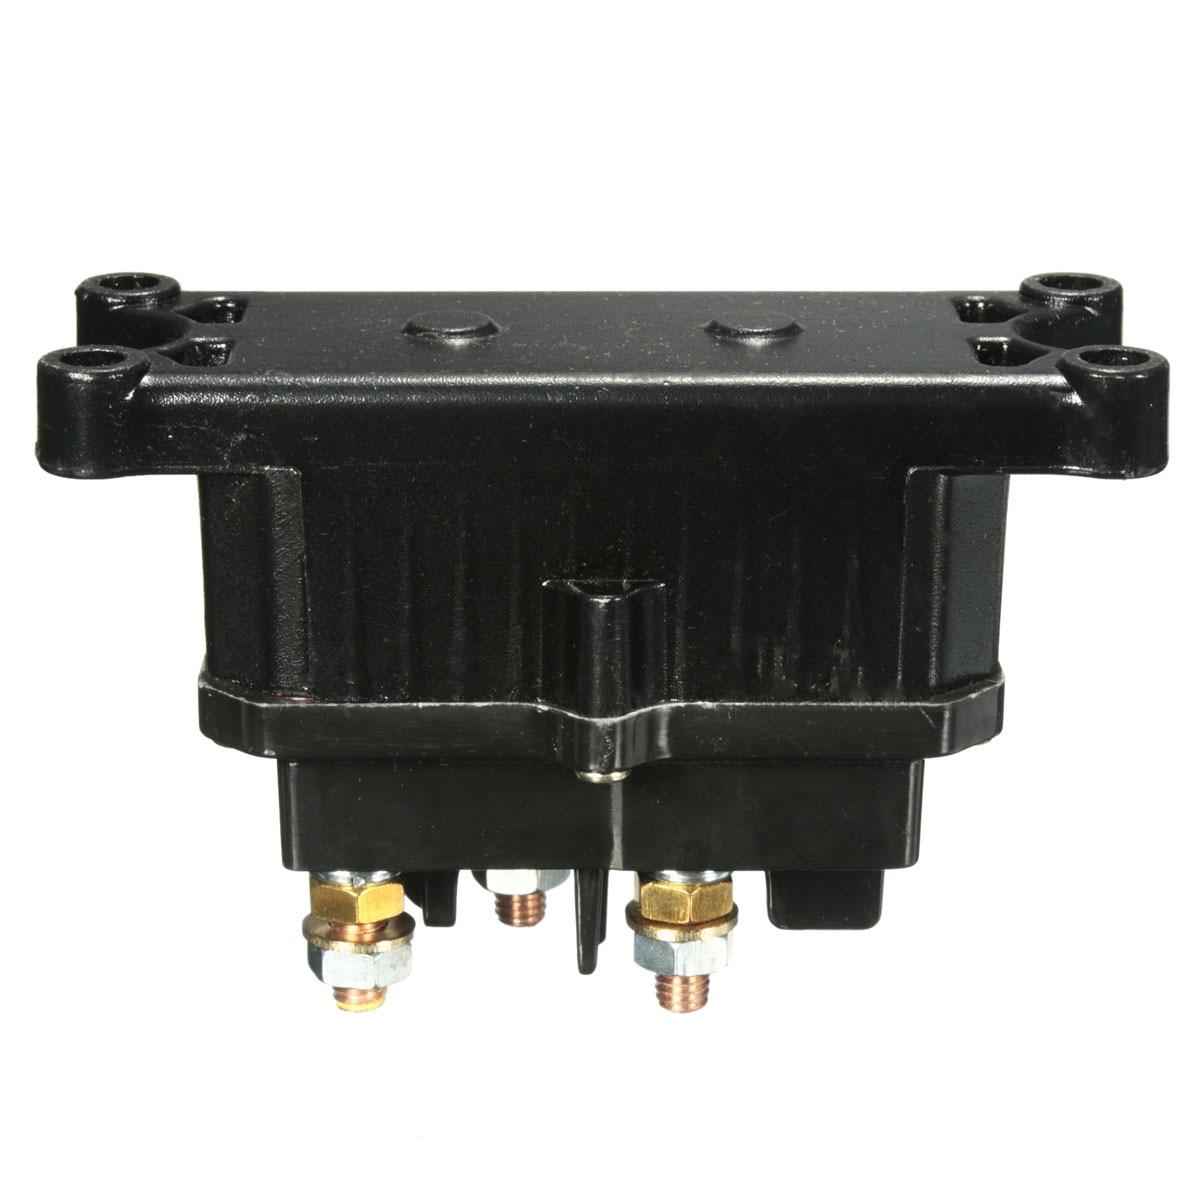 Nueva Universal 12 V Solenoide Relay Contactor Winch Interruptor Volt 1x2 20a 24 10a Del Coche Barco Marina Rv Laser Rocker